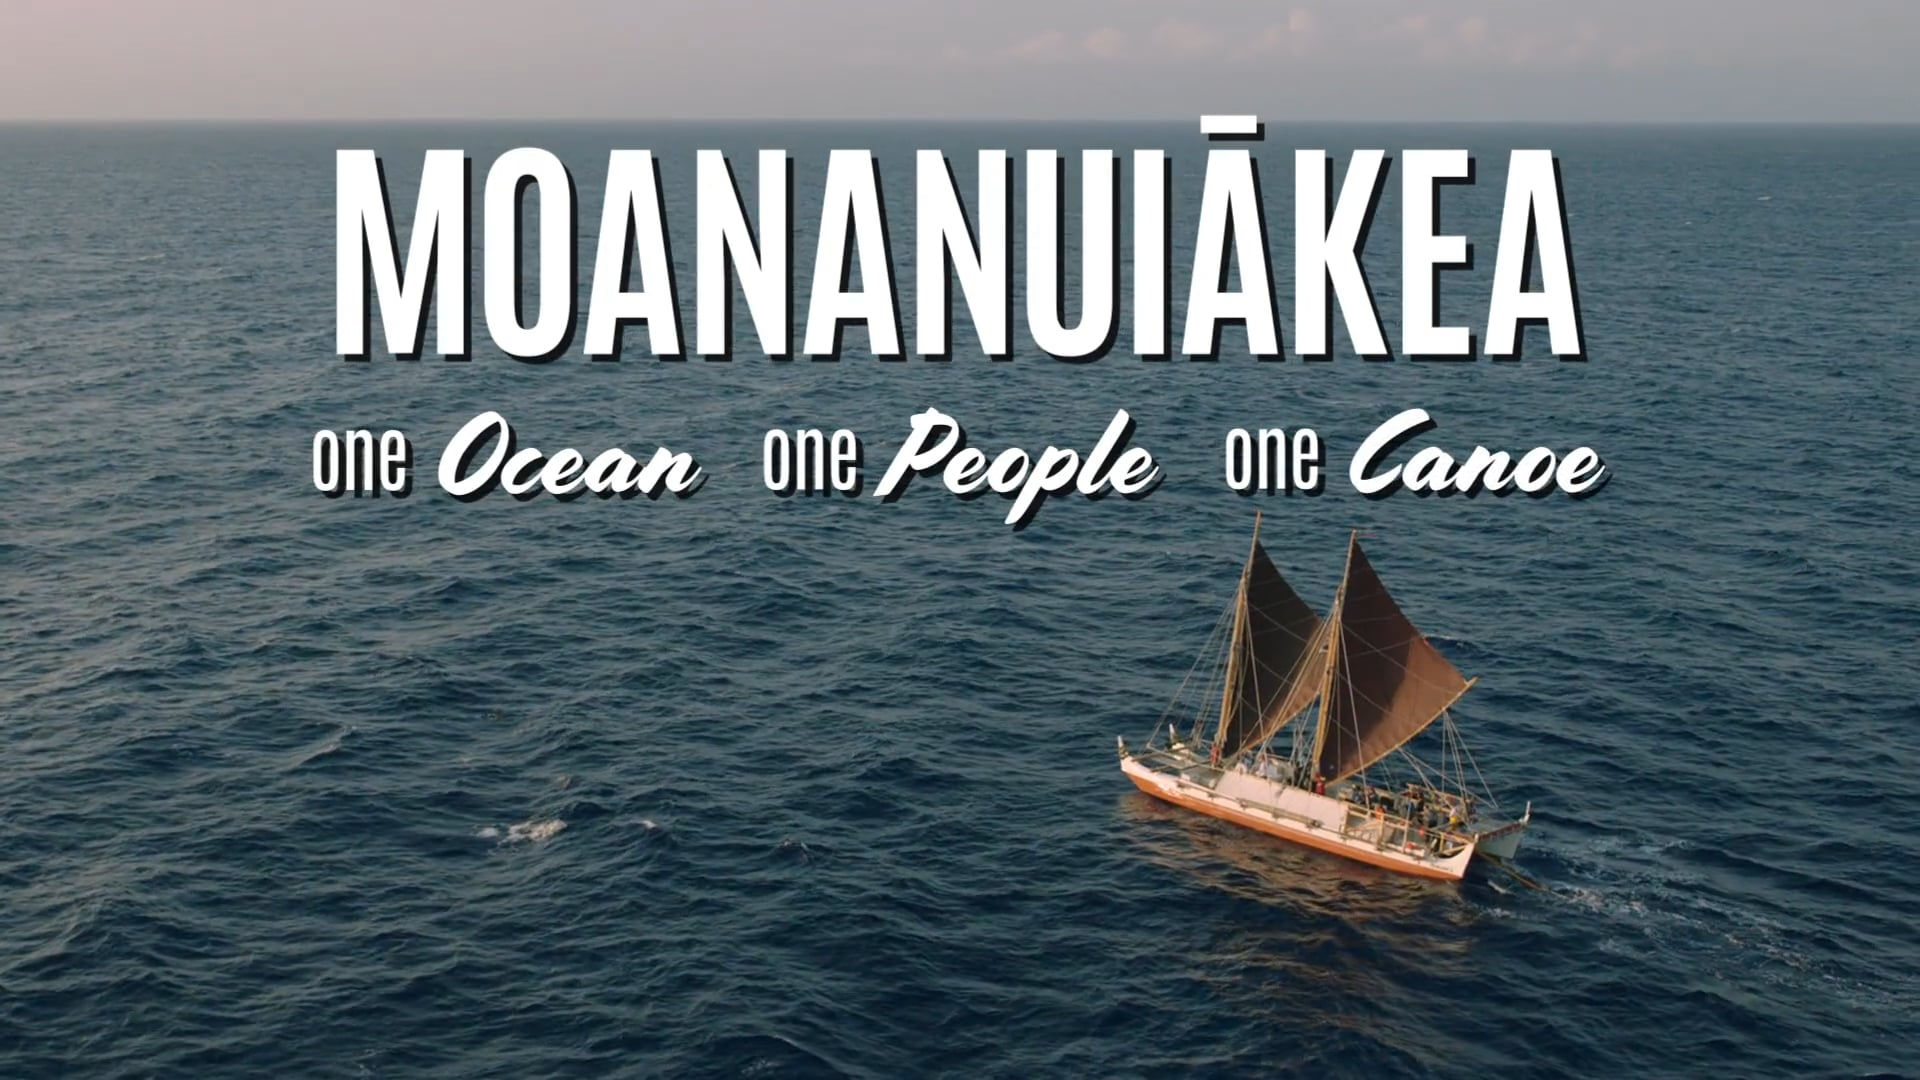 MOANANUIAKEA TRAILER